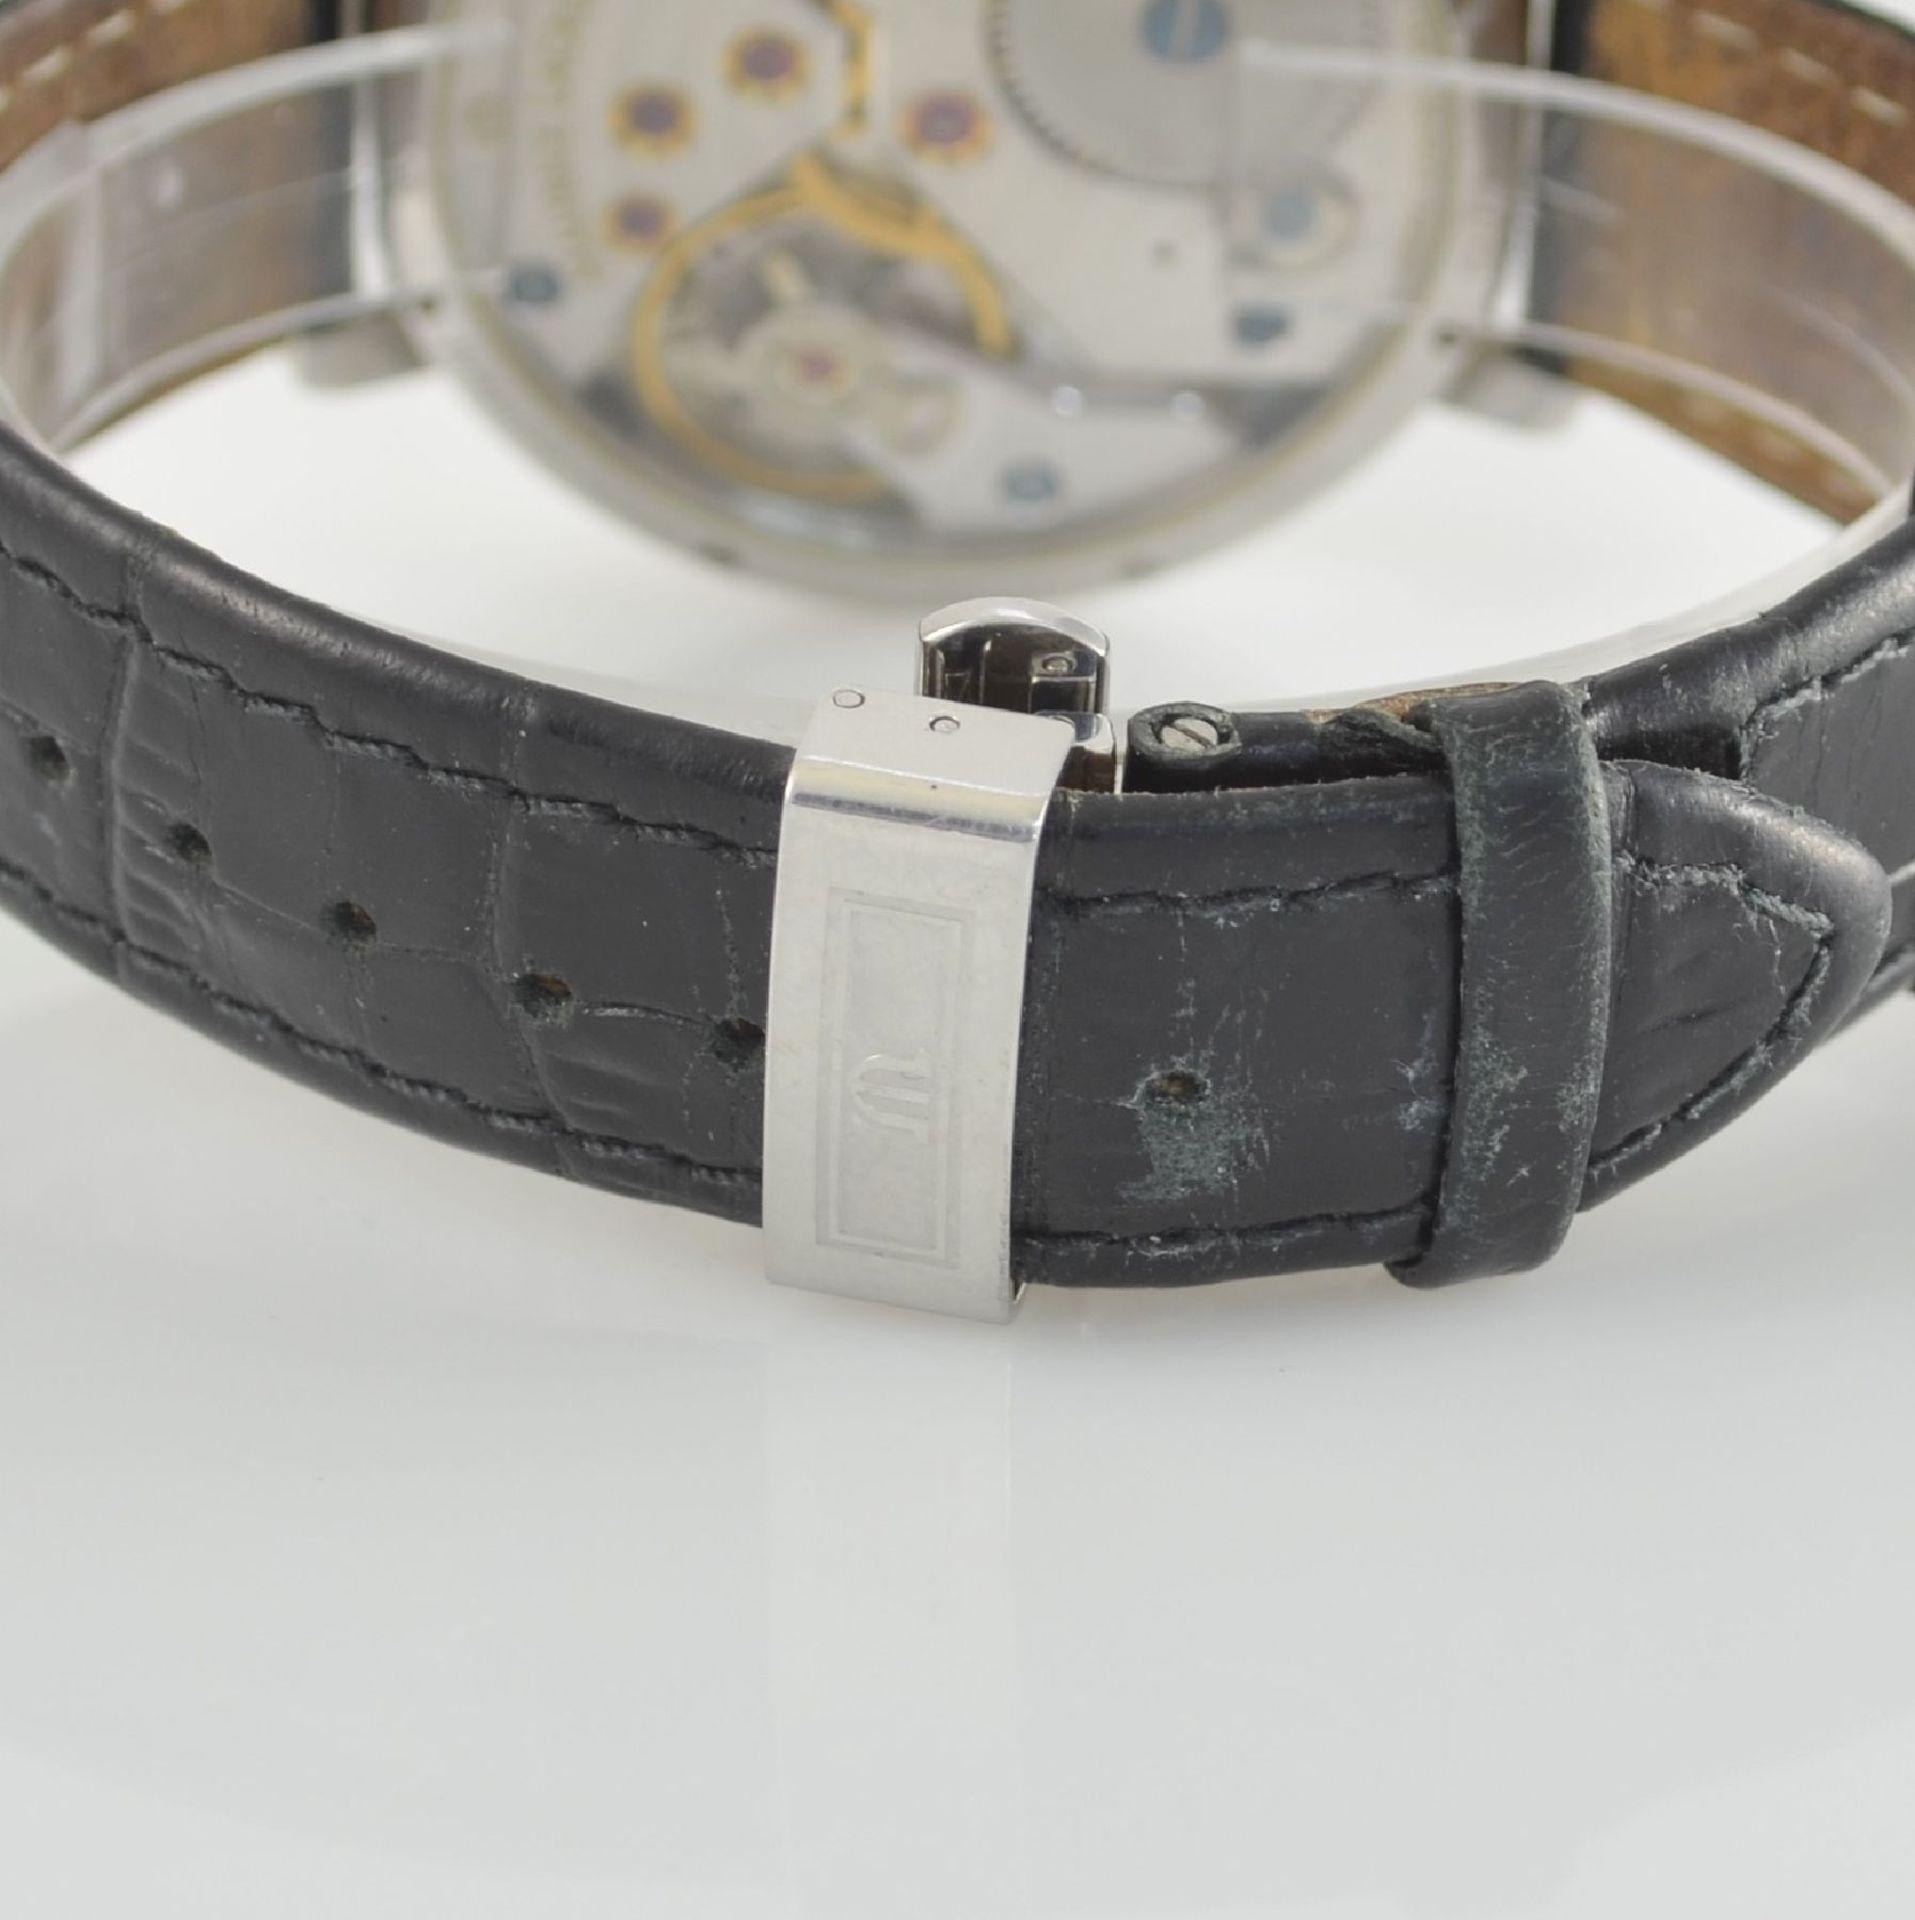 MAURICE LACROIX Herrenarmbanduhr aus der Masterpiece Collection Modell Calendrier Rétrograde, - Bild 5 aus 7